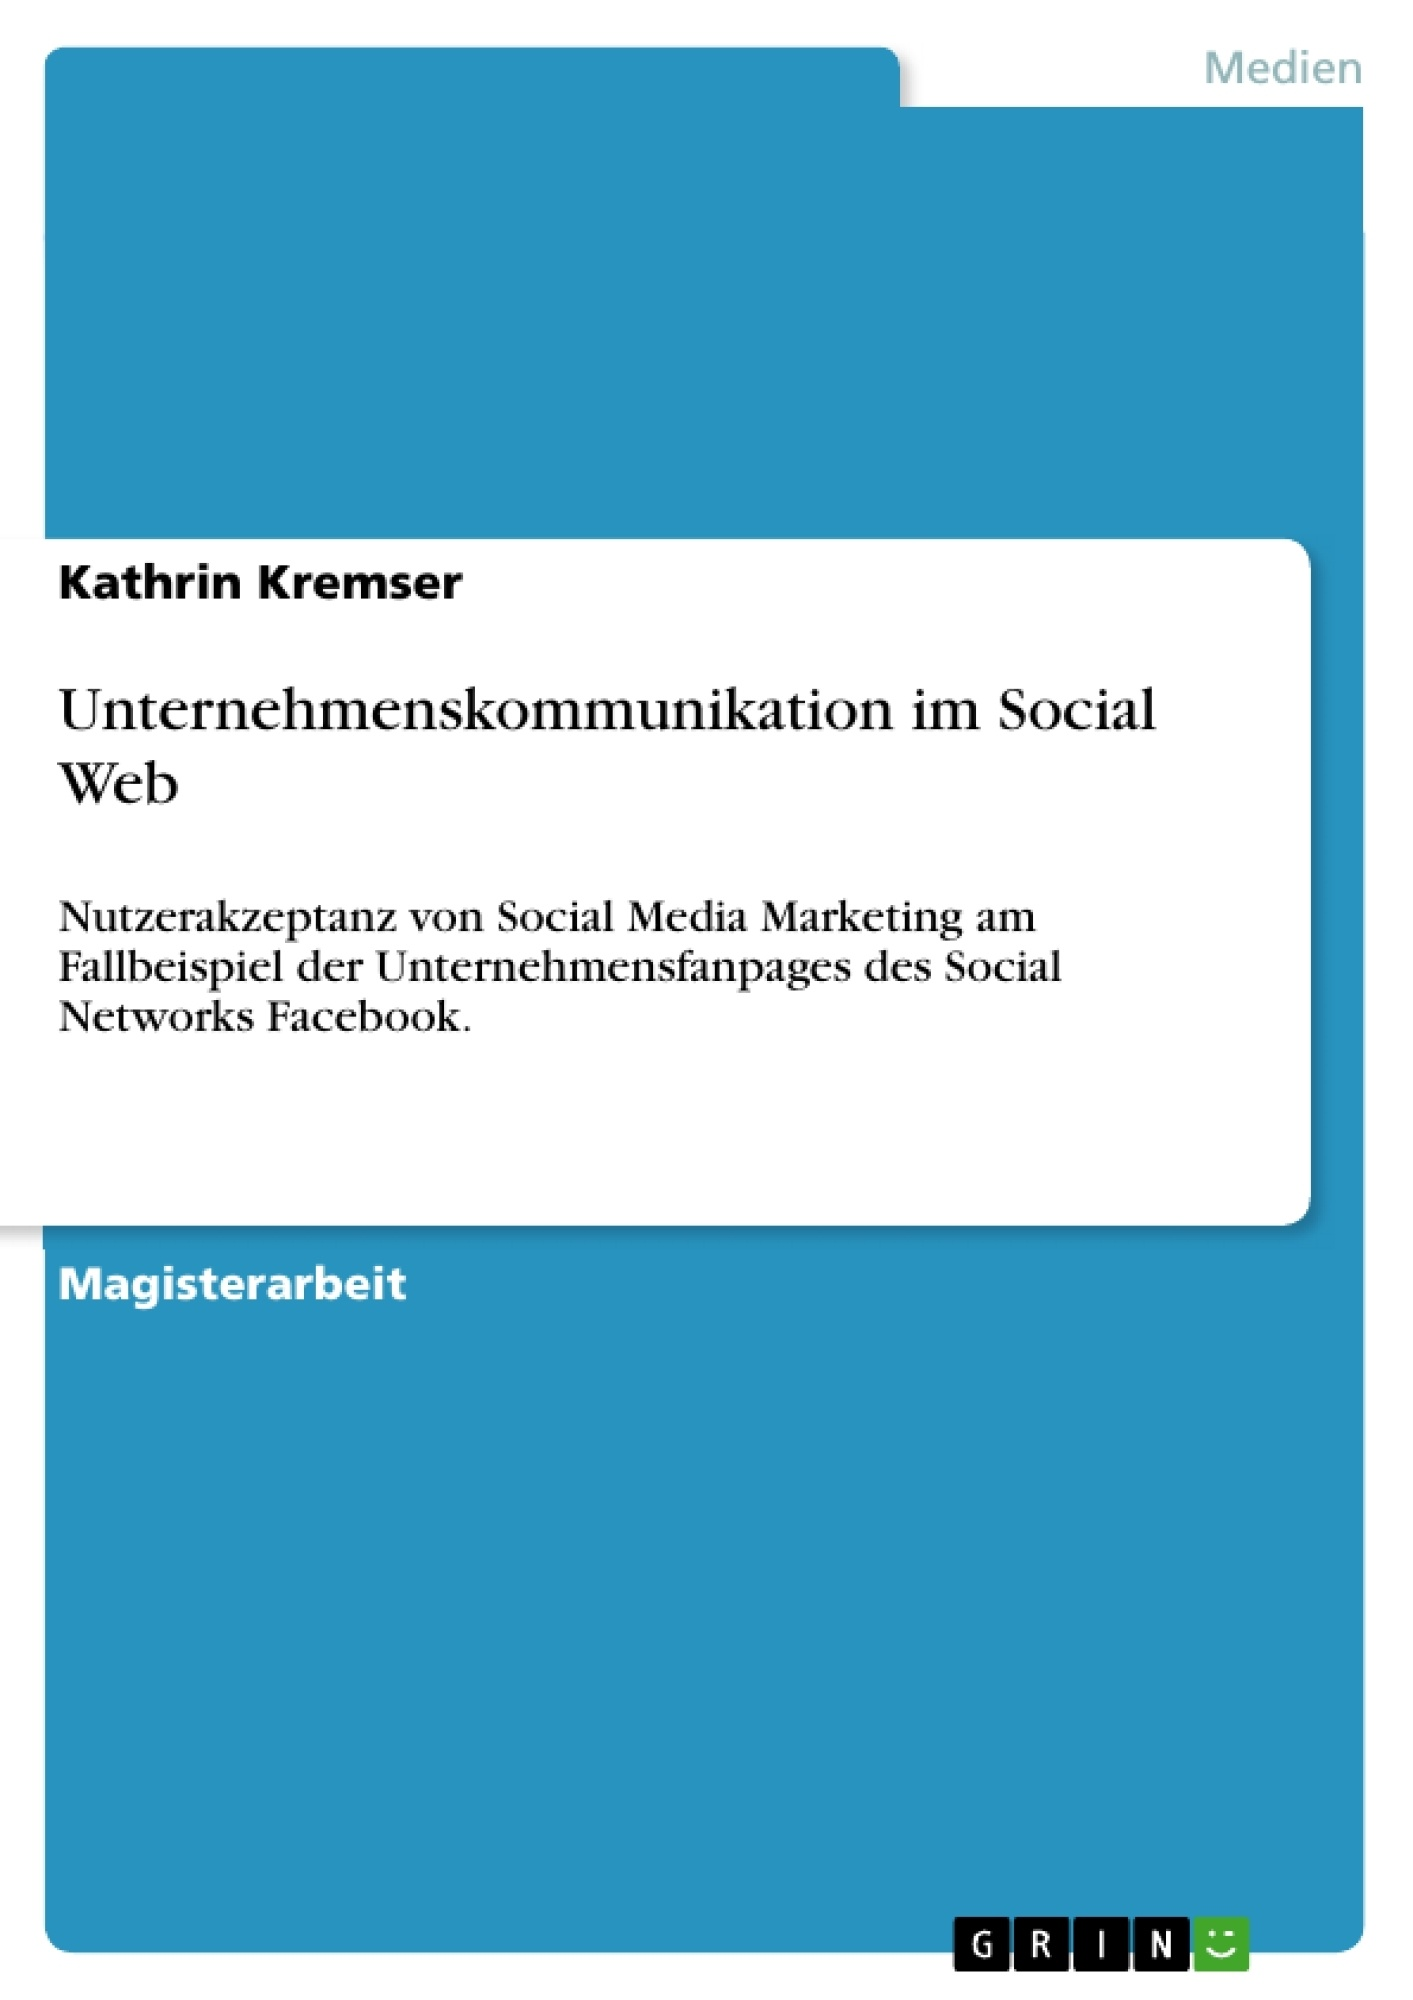 Titel: Unternehmenskommunikation im Social Web